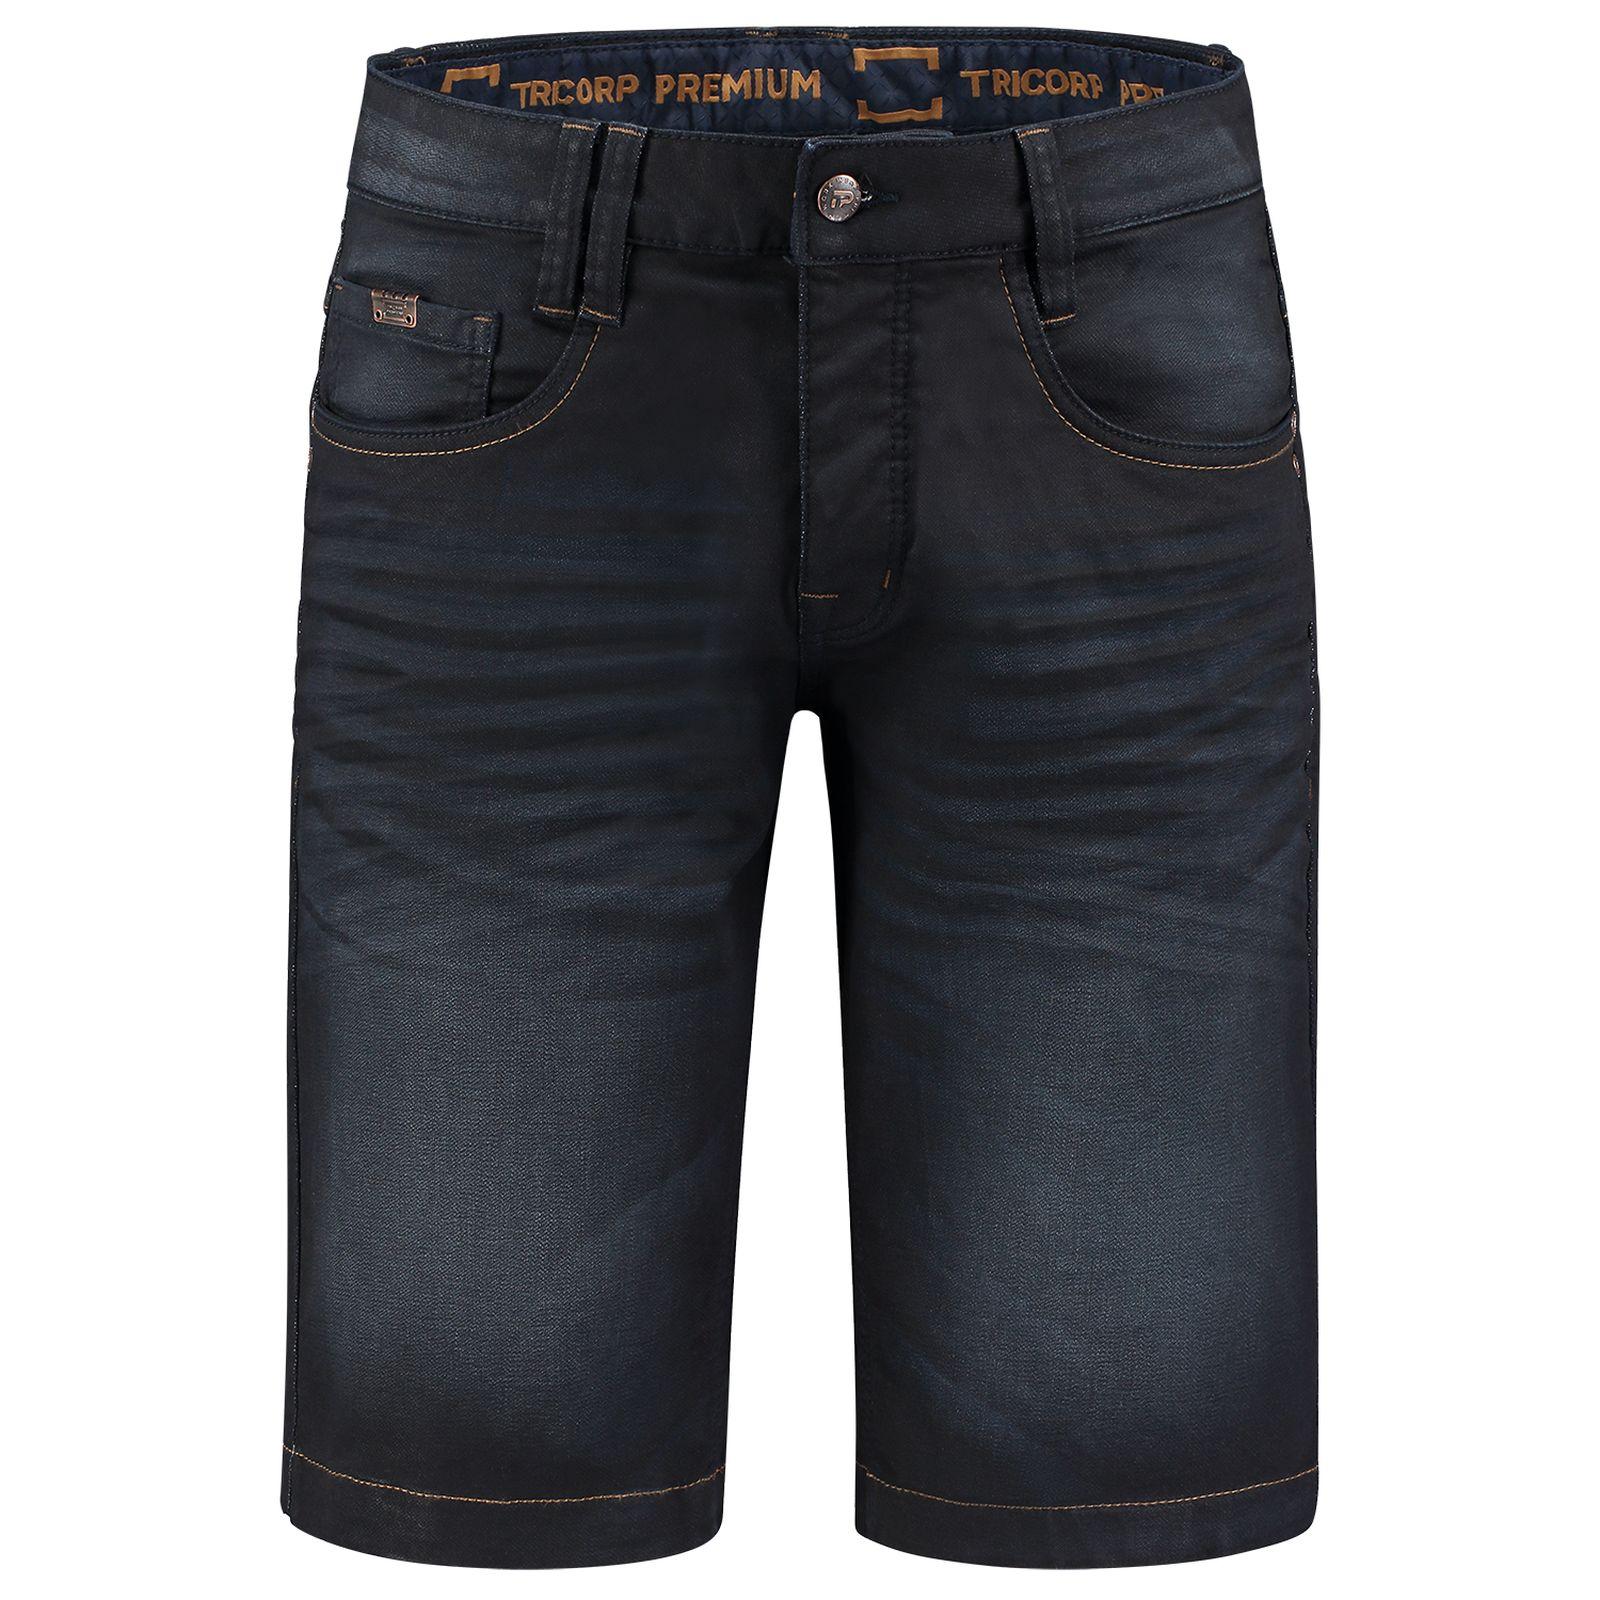 Tricorp Broeken 504010 Stretch denimblauw(Denimblue)